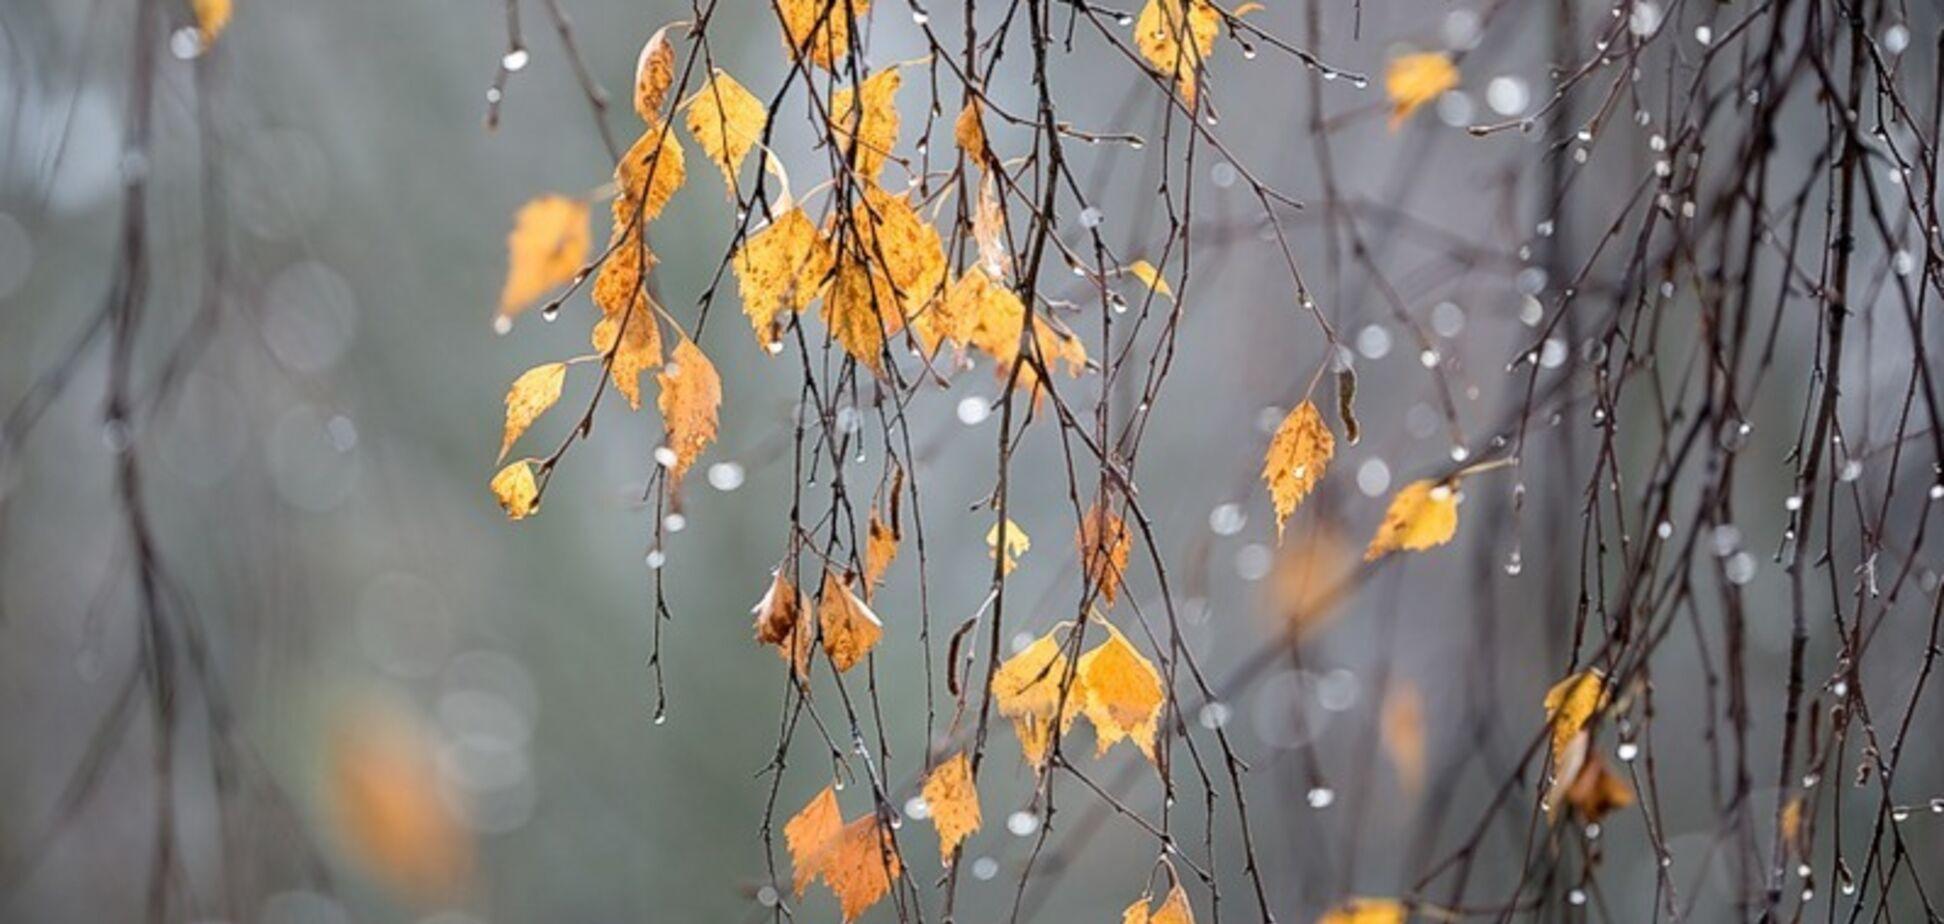 Зима здалася: синоптикиня уточнила прогноз погоди в Україні